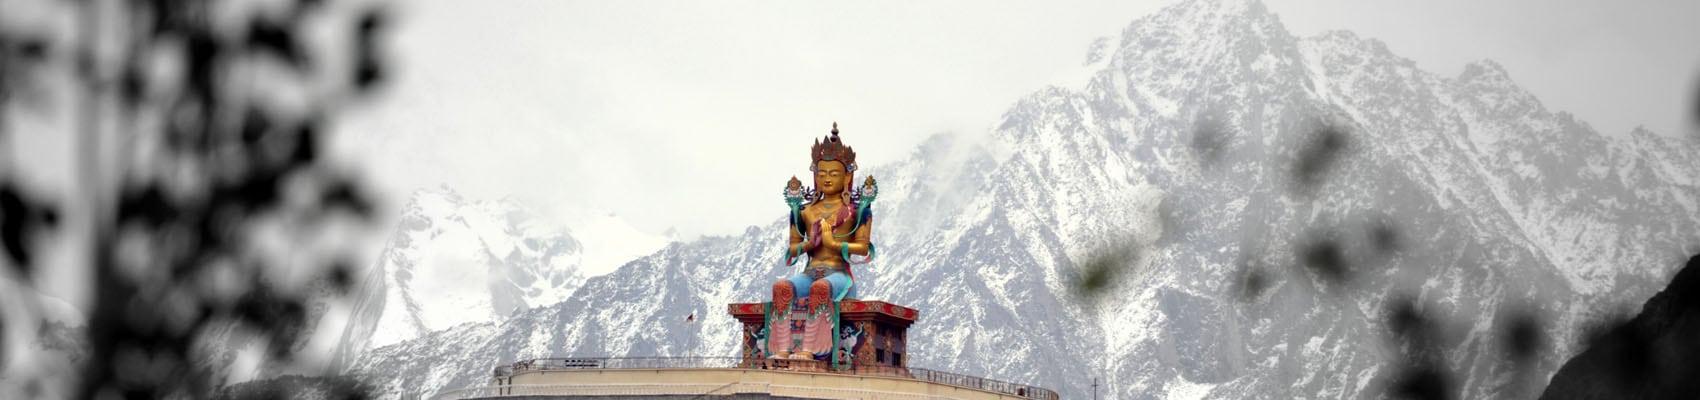 Photo-Credit-Priyambada-Nath-Buddha-in-Meditation-via-Flickr